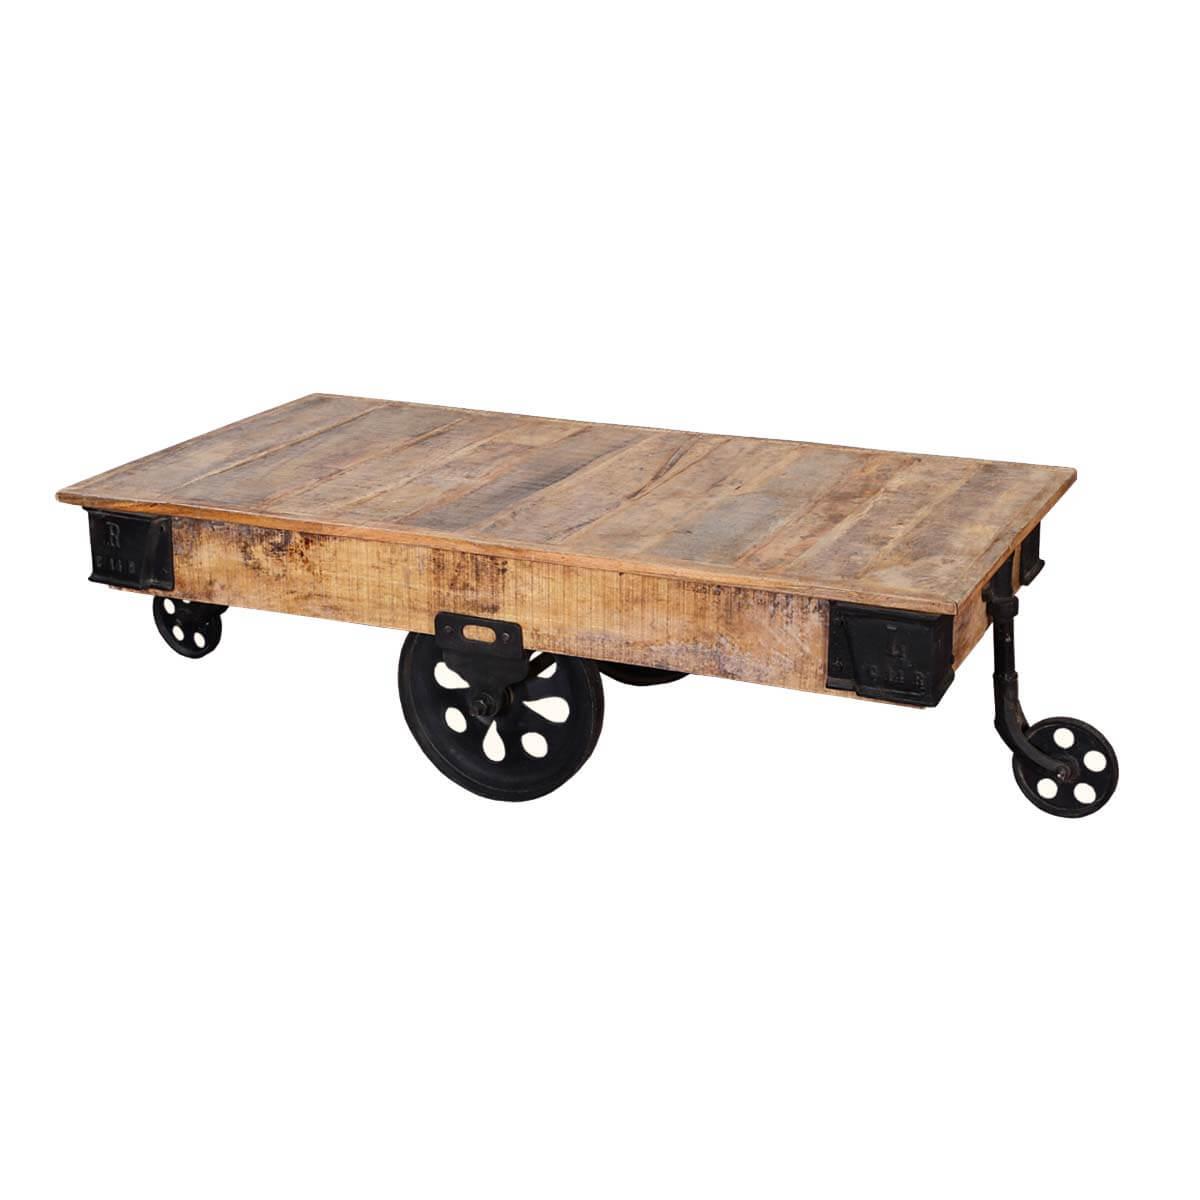 Rustic Wood Pallet Coffee Table: Industrial Rustic Factory Cart Coffee Table